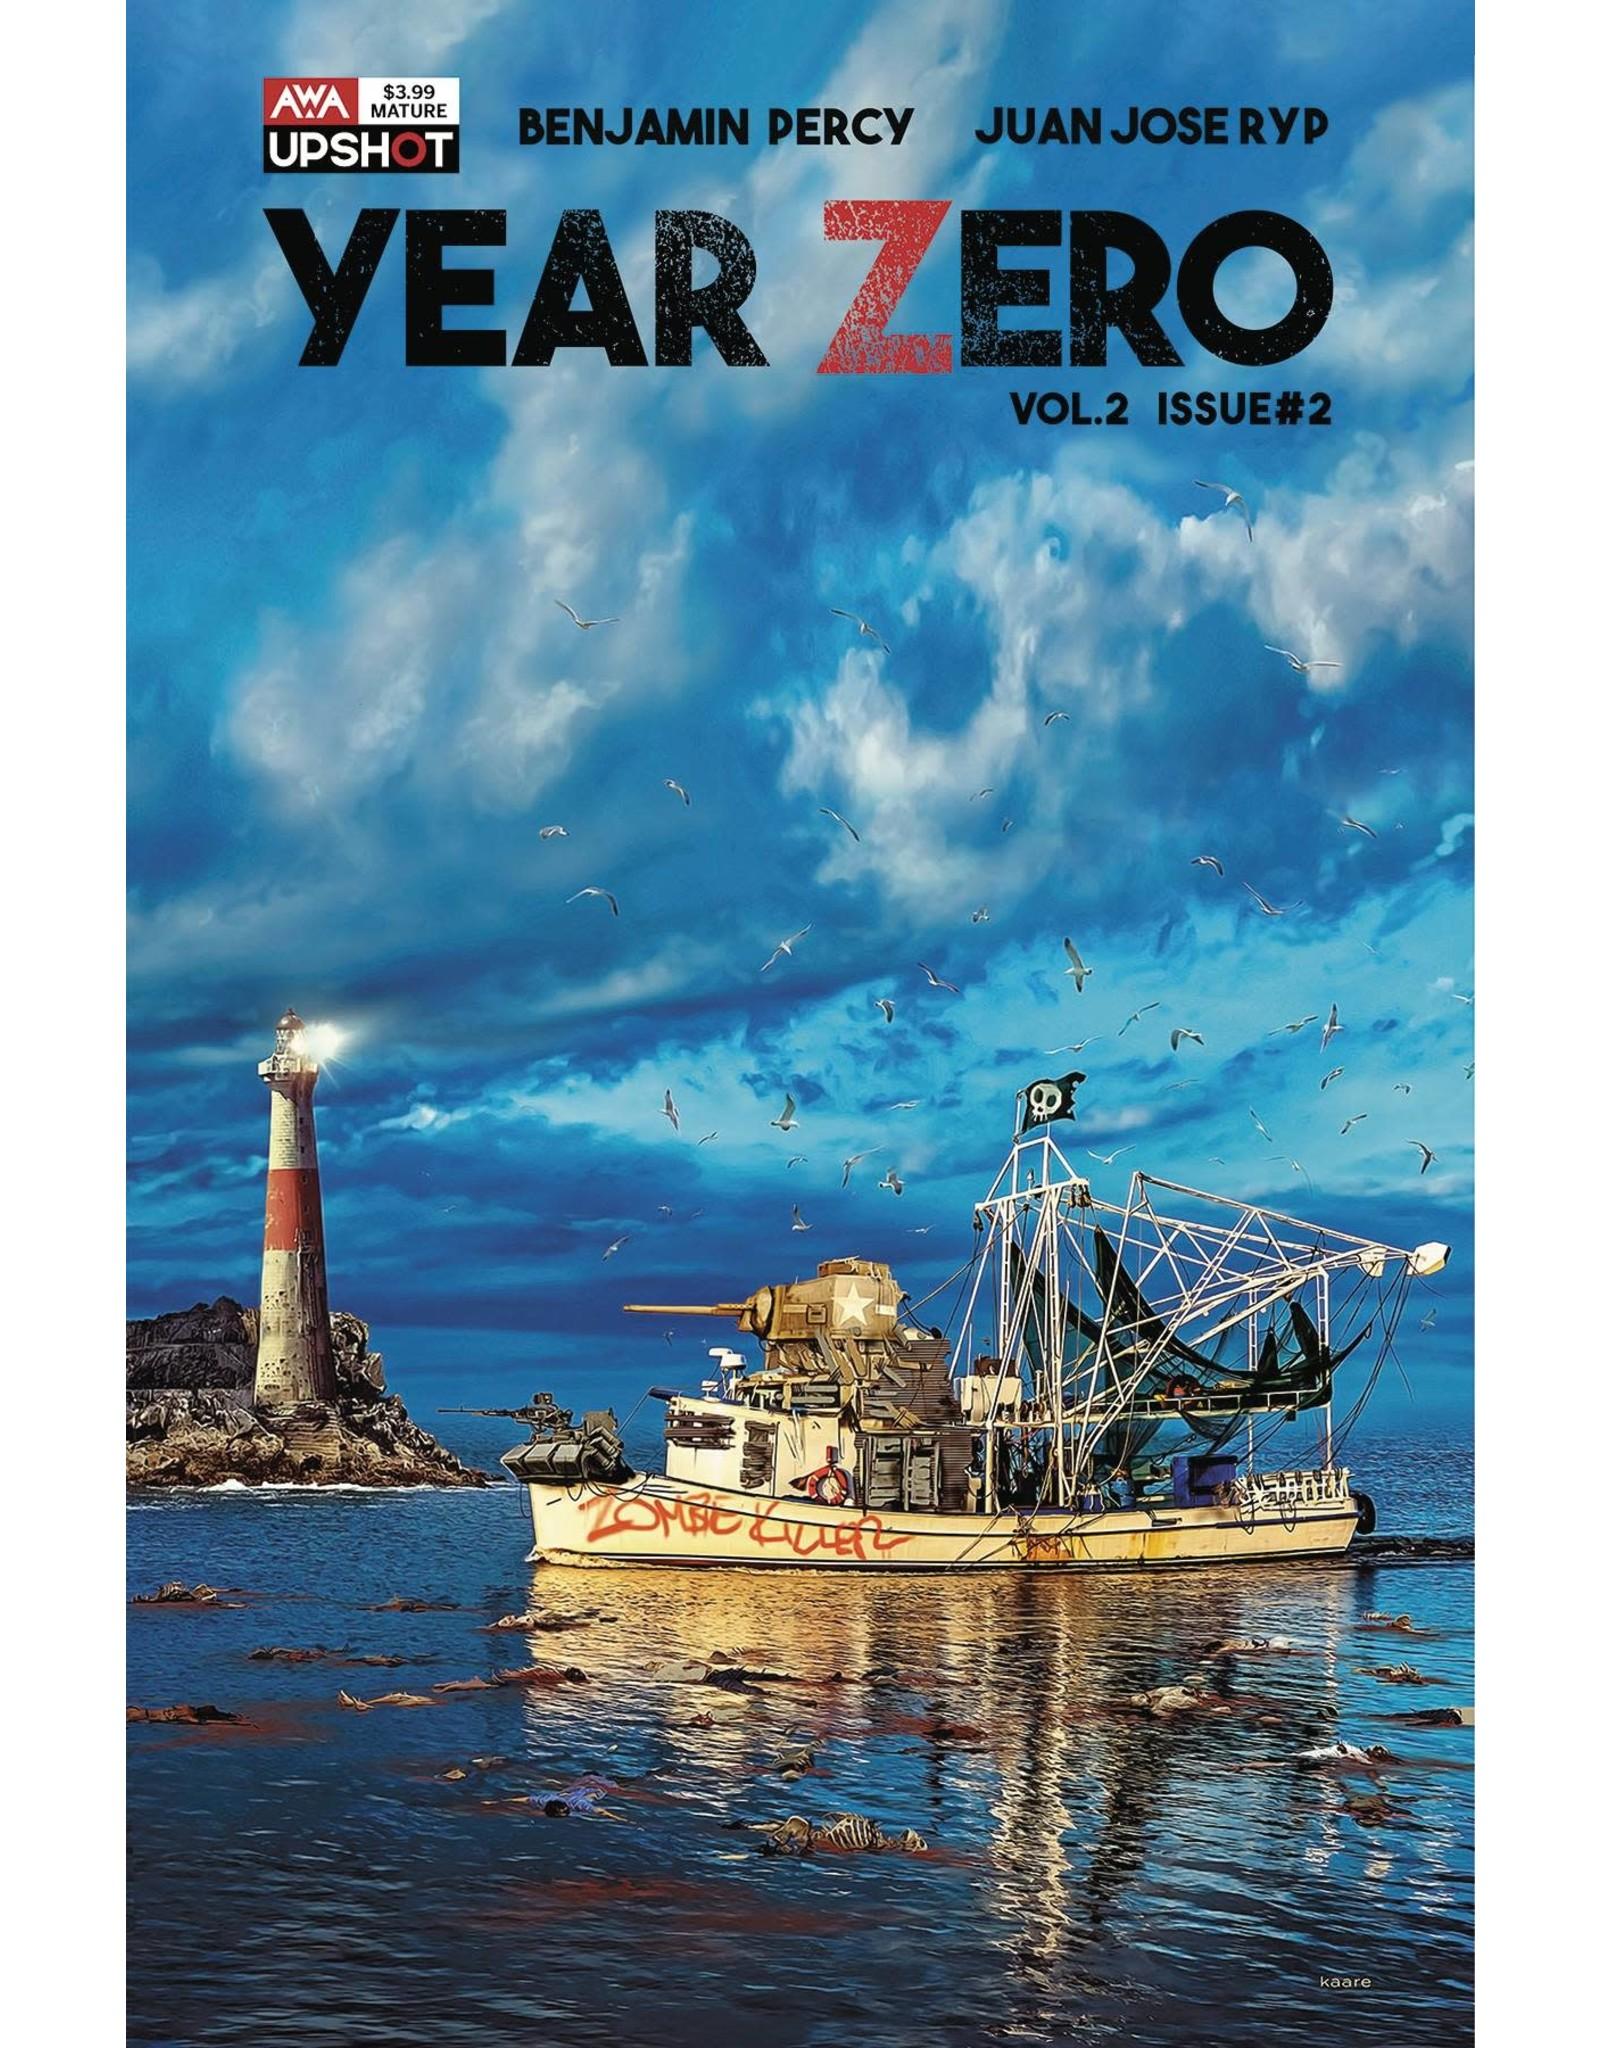 ARTISTS WRITERS & ARTISANS INC YEAR ZERO VOL 2 #2